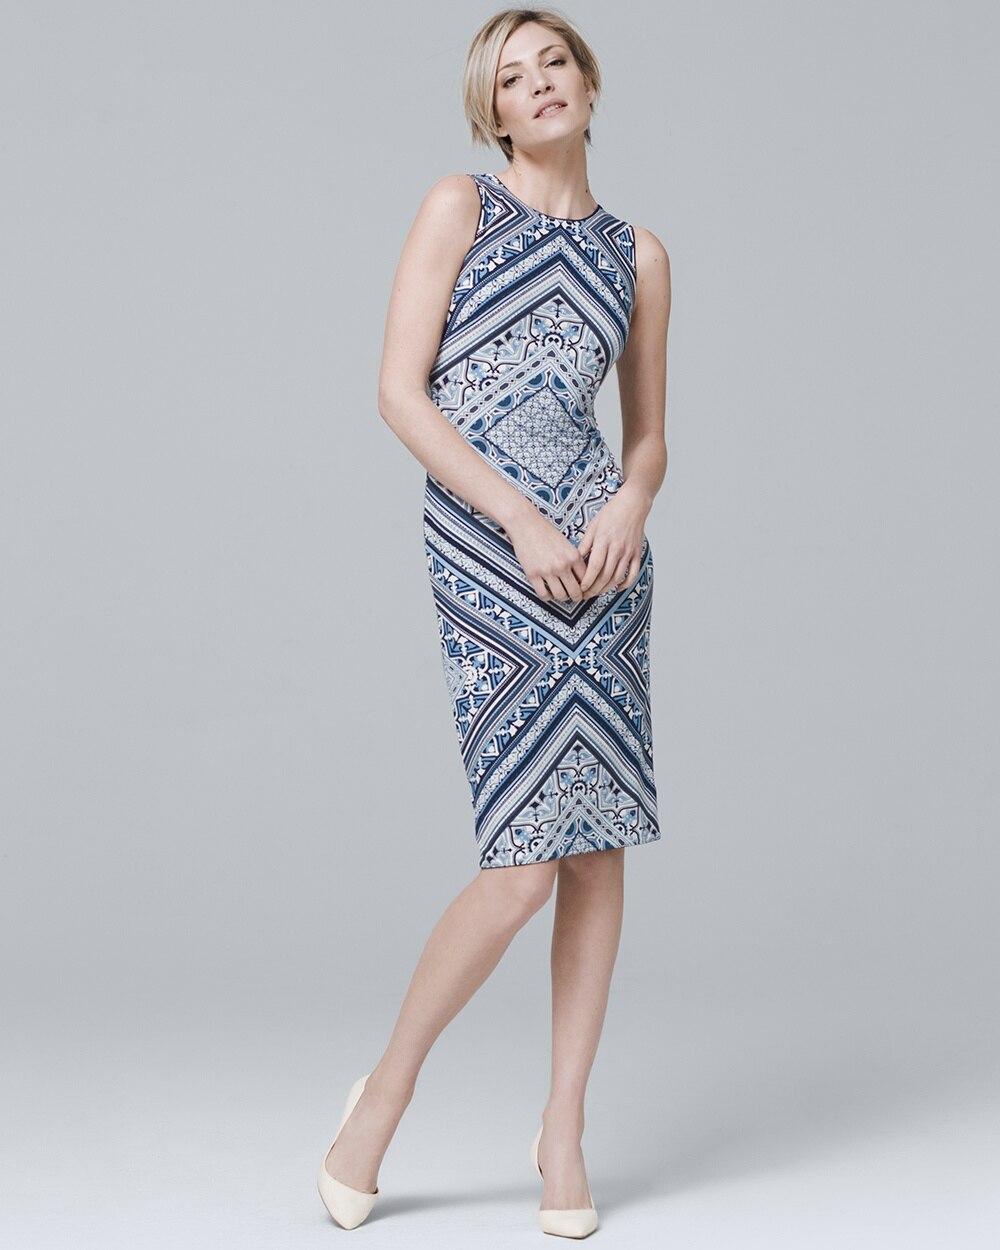 a2b789f1ea Reversible Sleeveless Knit Sheath Dress - White House Black Market